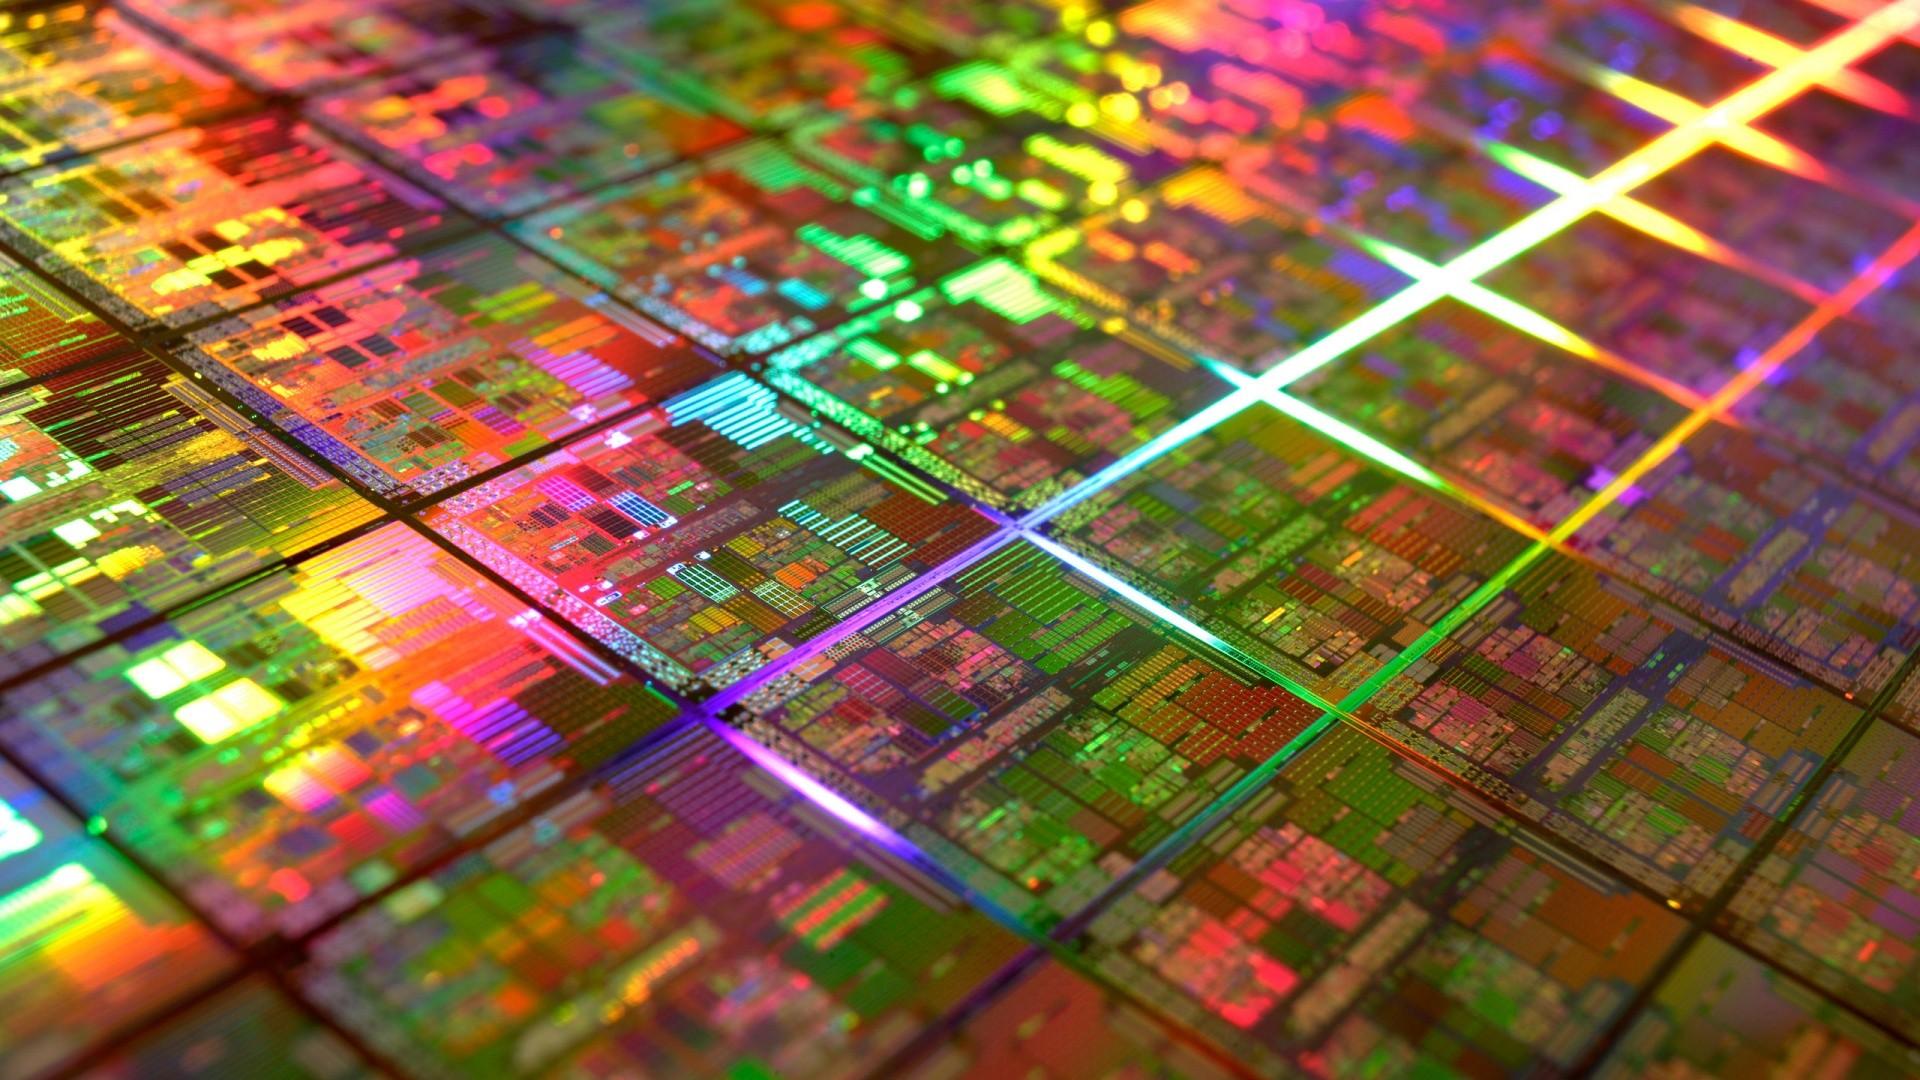 In-Depth: Understanding the Cortex A53 on Mobile SoCs